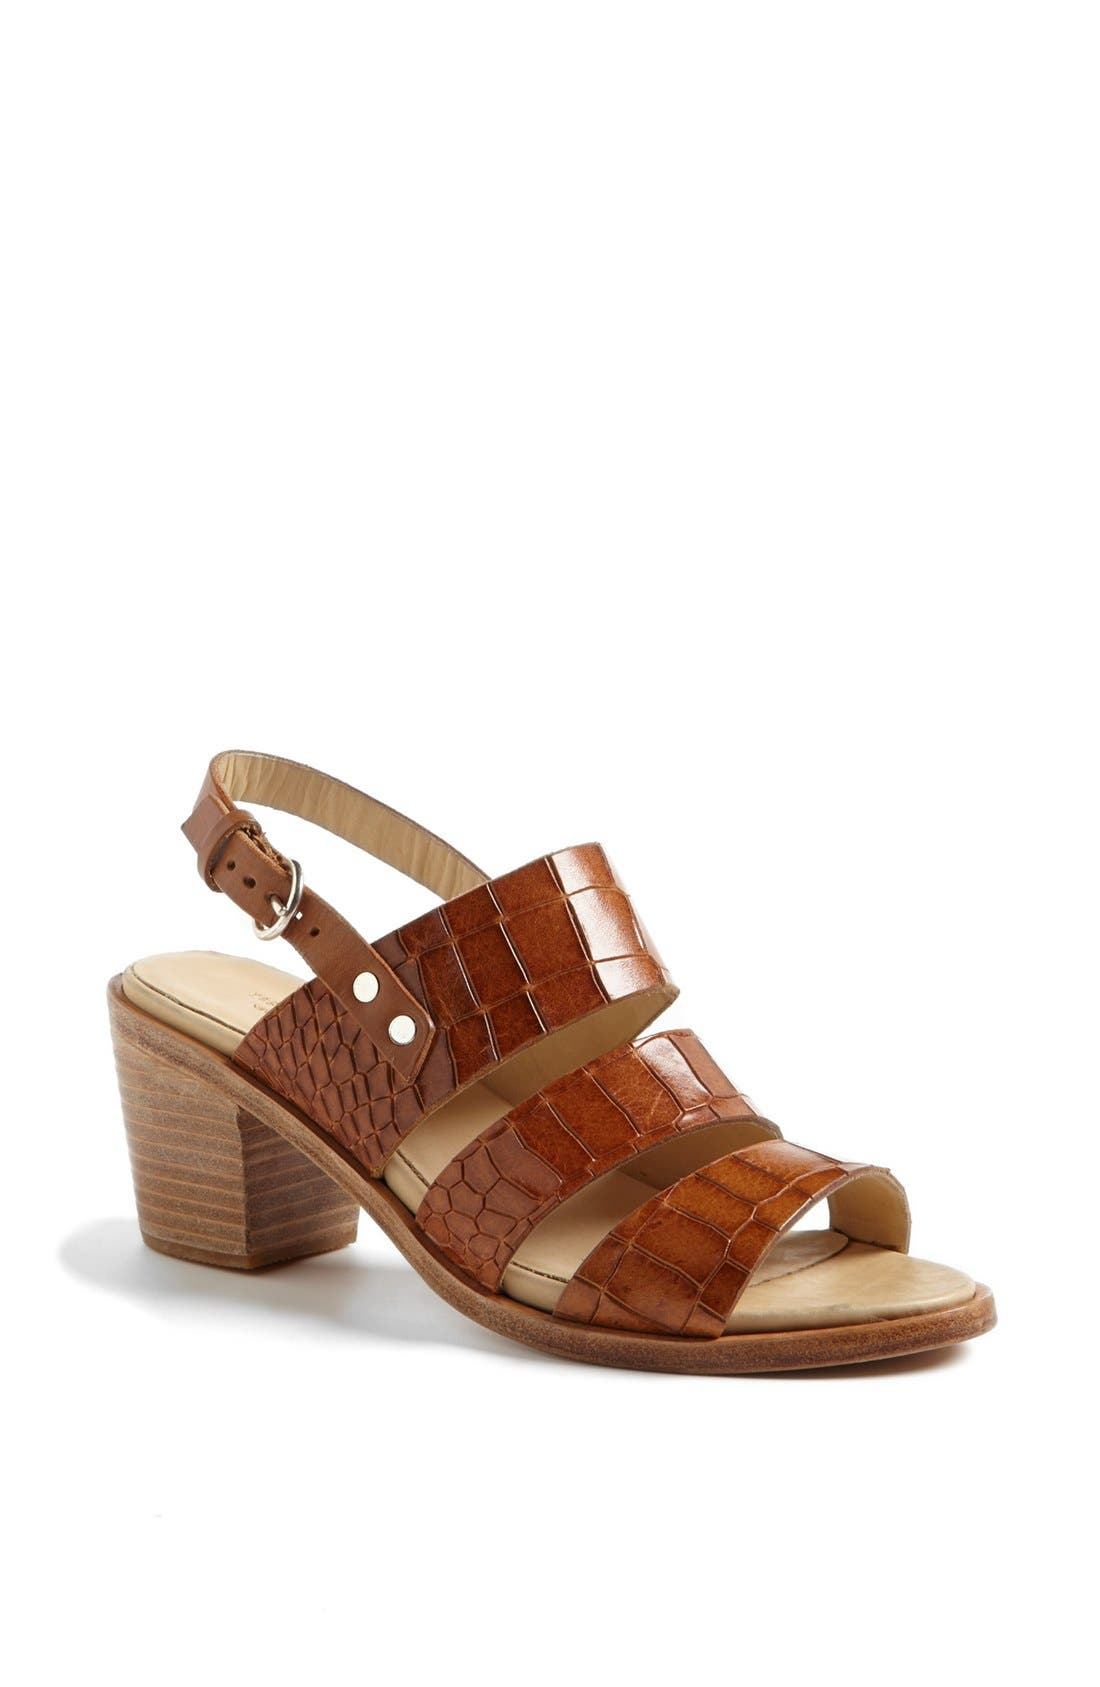 Main Image - rag & bone 'Folsom' Croc Embossed Sandal (Online Only)